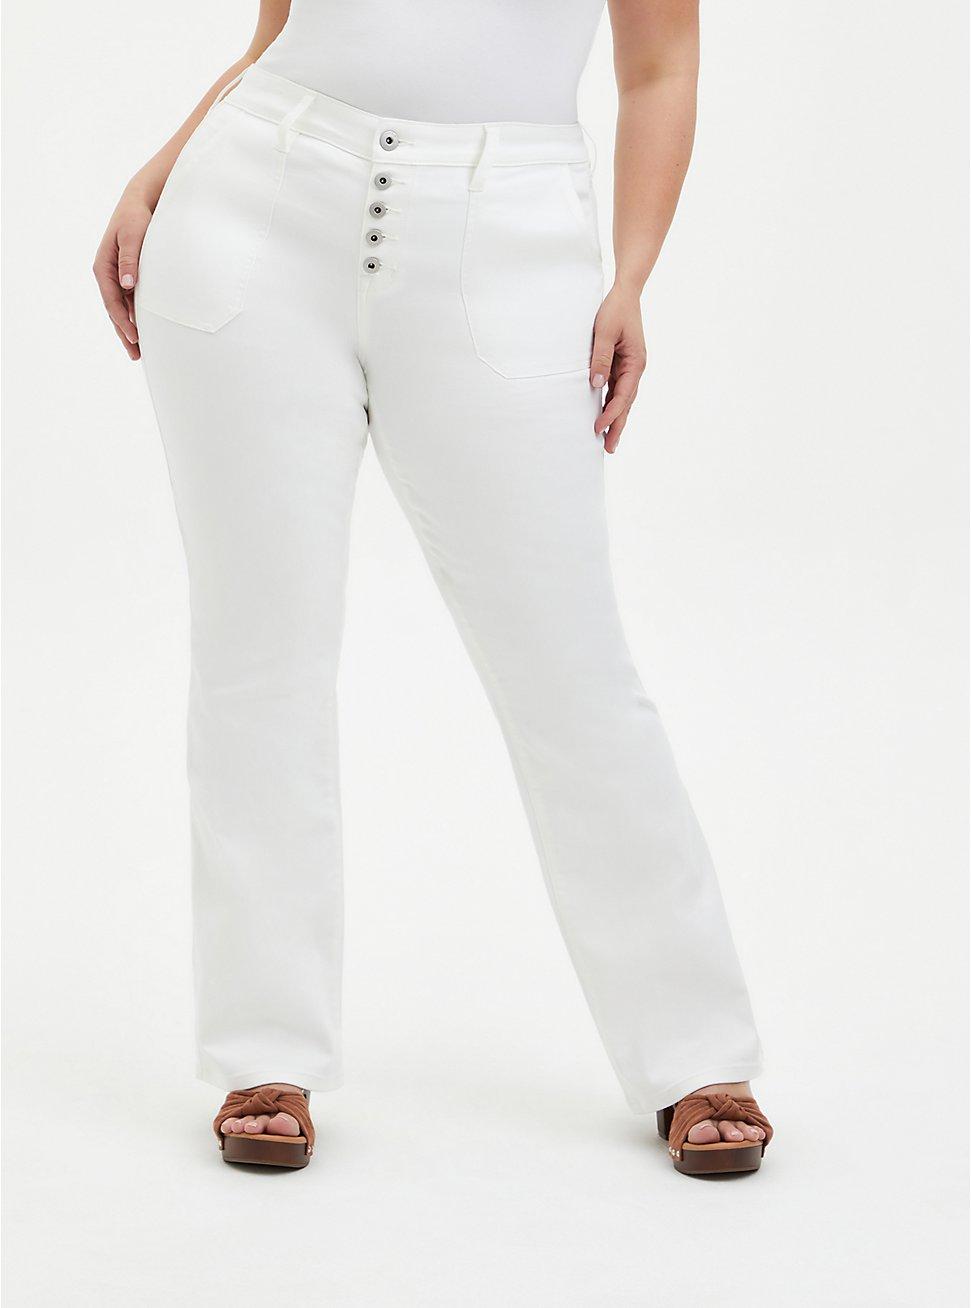 Mid Rise Flare Jean - Super Soft White, WINTER WHITE, hi-res